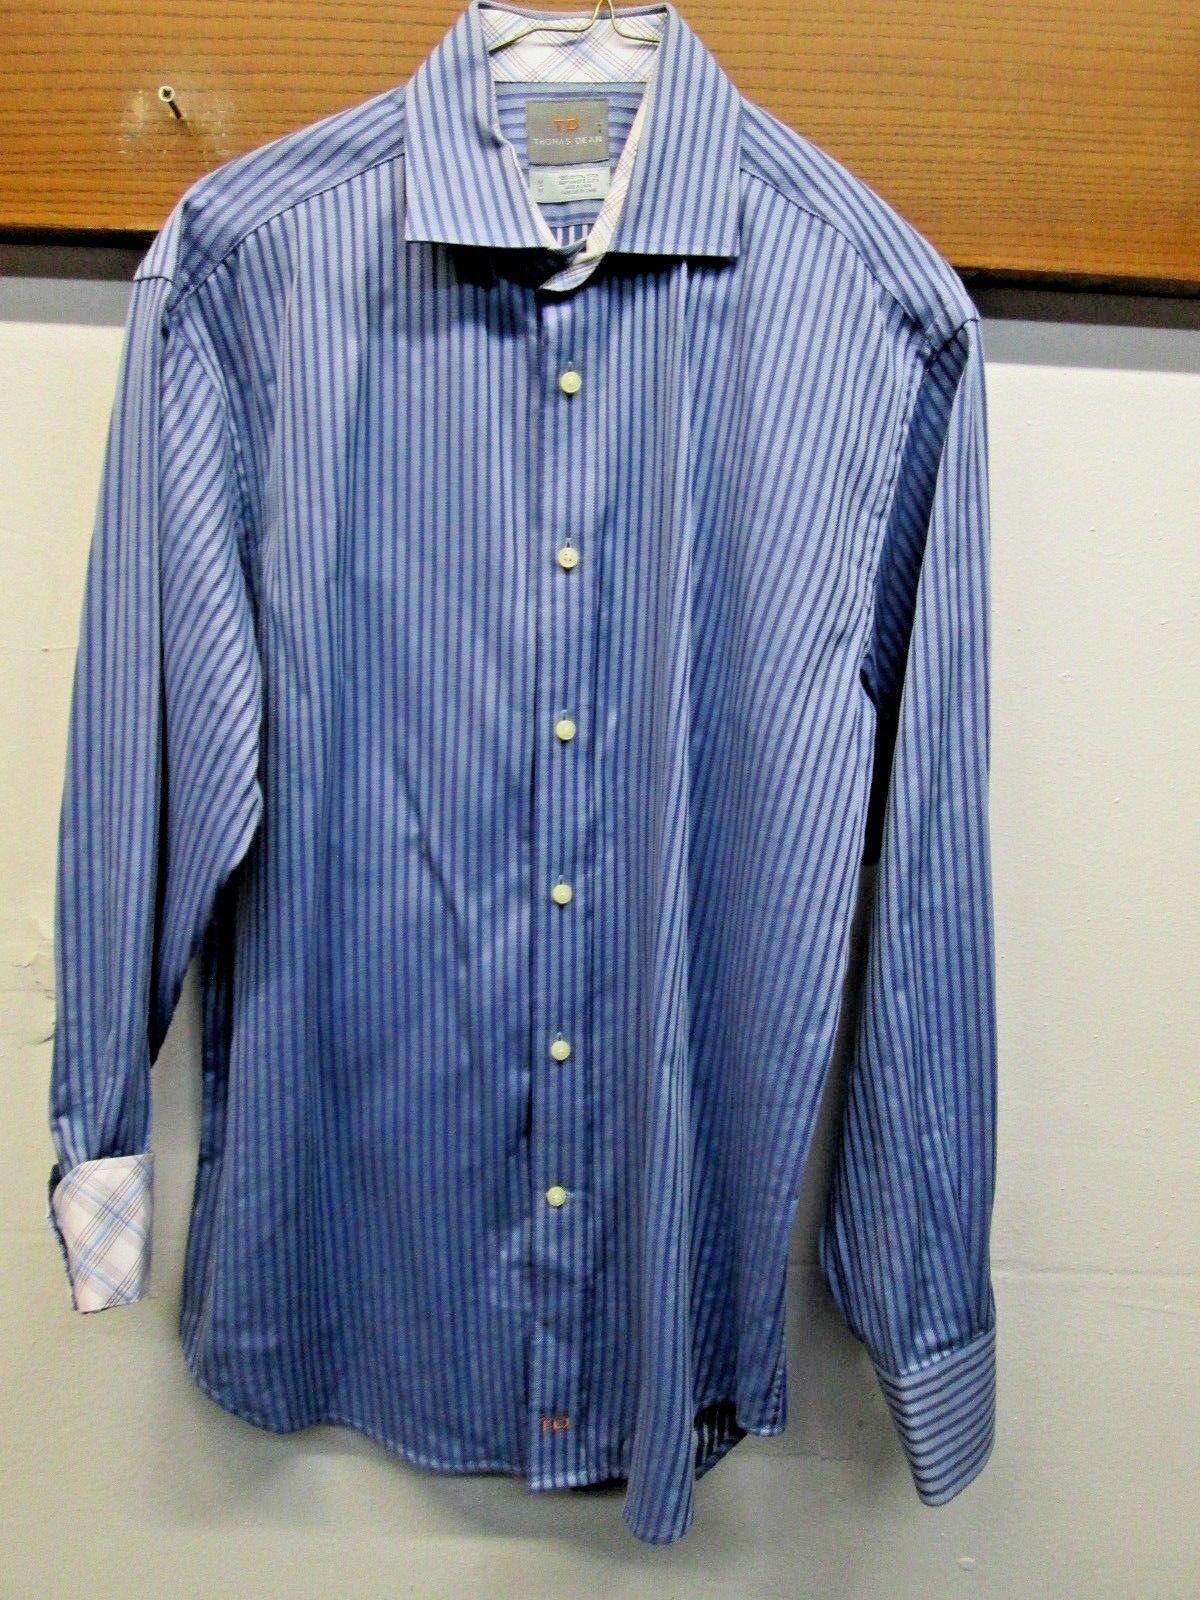 EUC  Thomas Dean Sport Shirt Casual Club flip cuff bluee striped spread collar XL